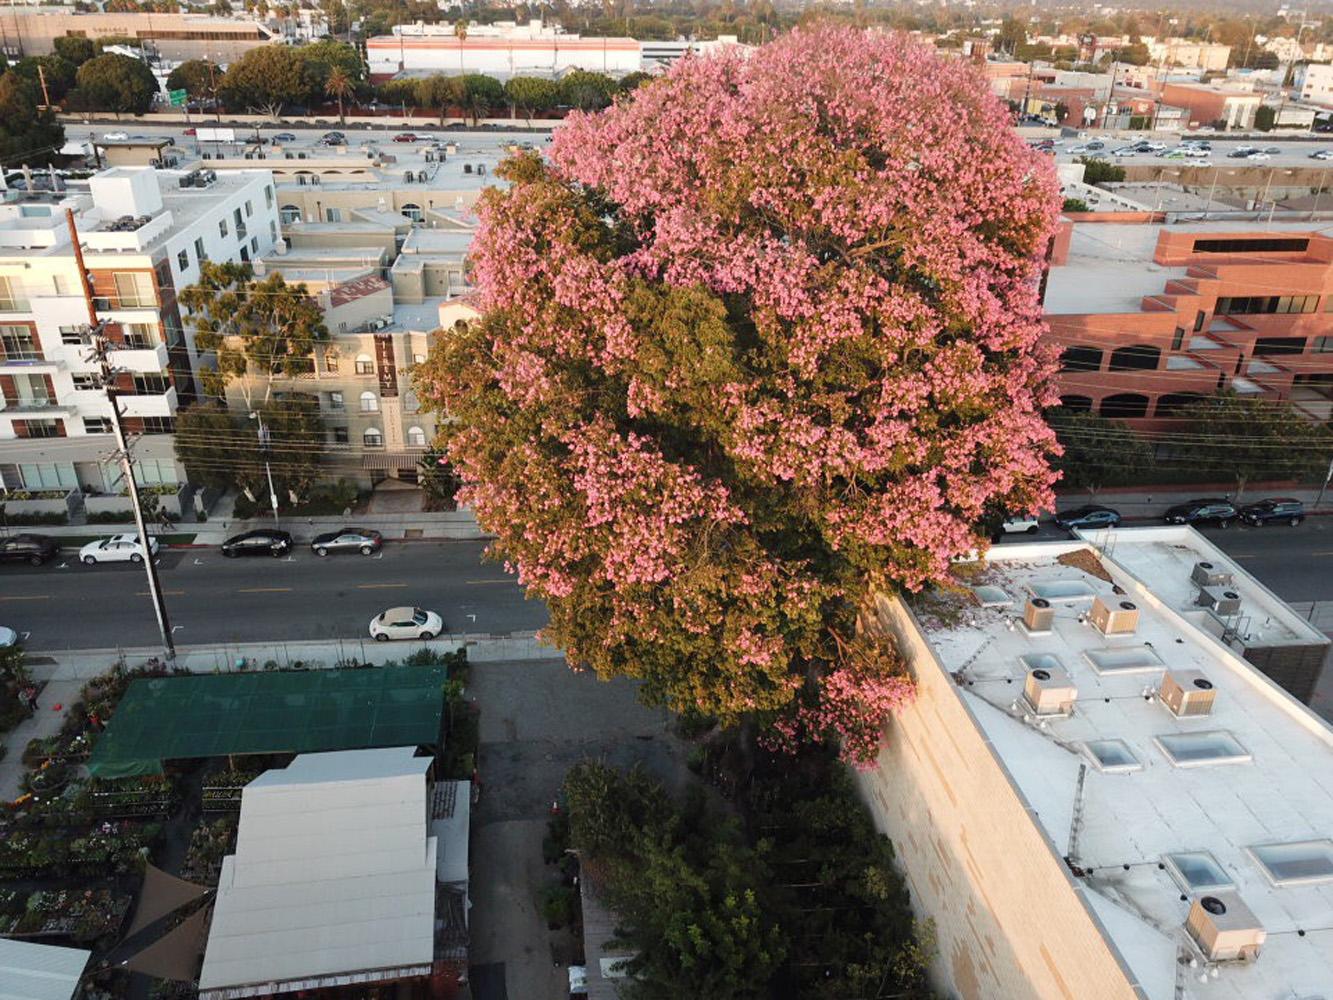 A Gigantic Tree